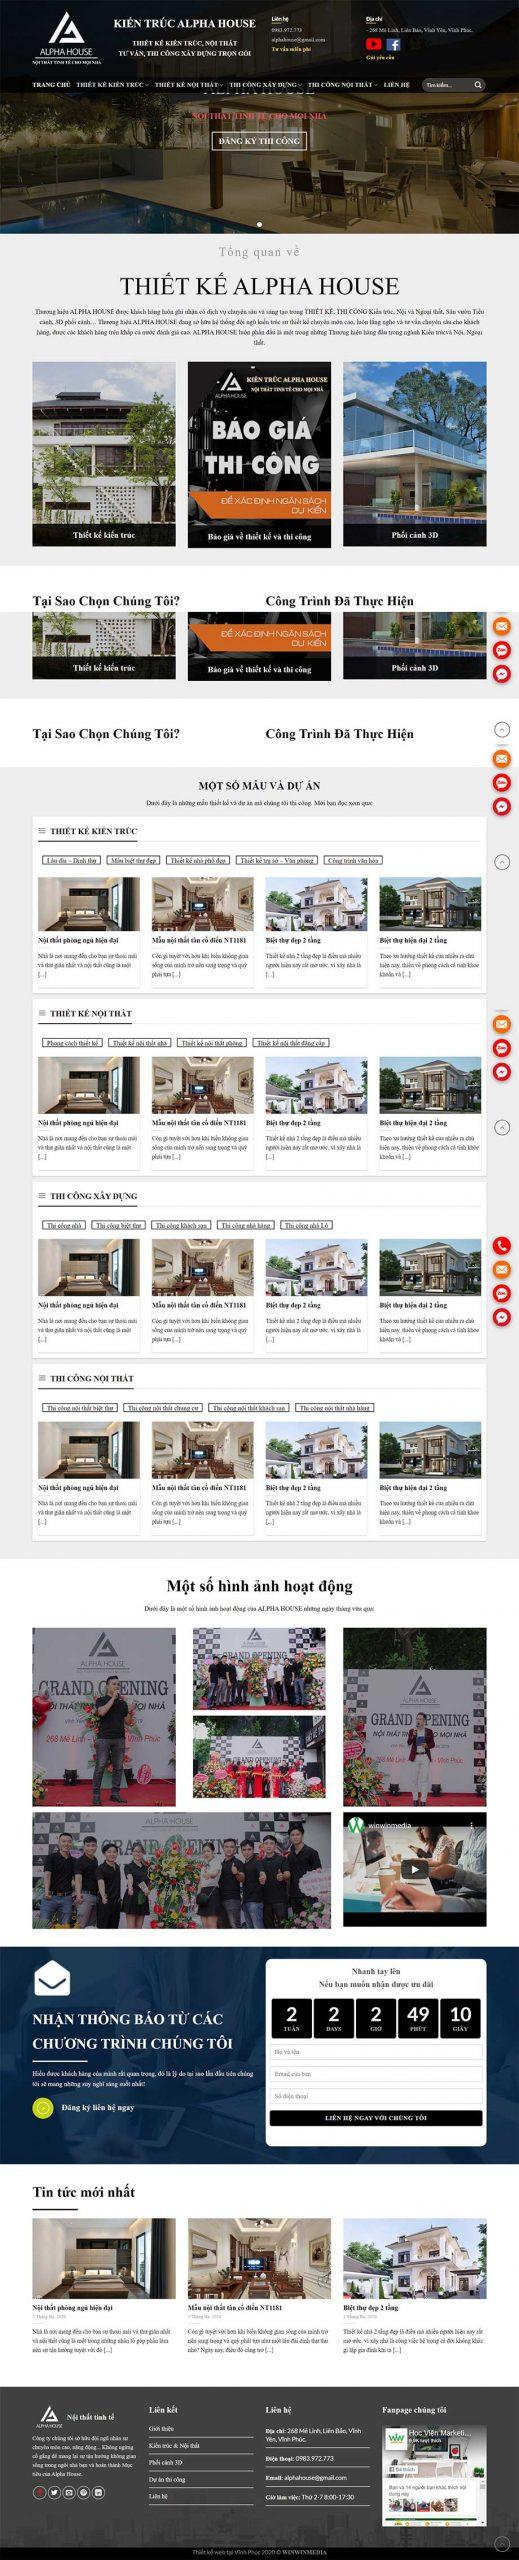 Thiết kế mẫu web kiến trúc  ALPHA HOUSE